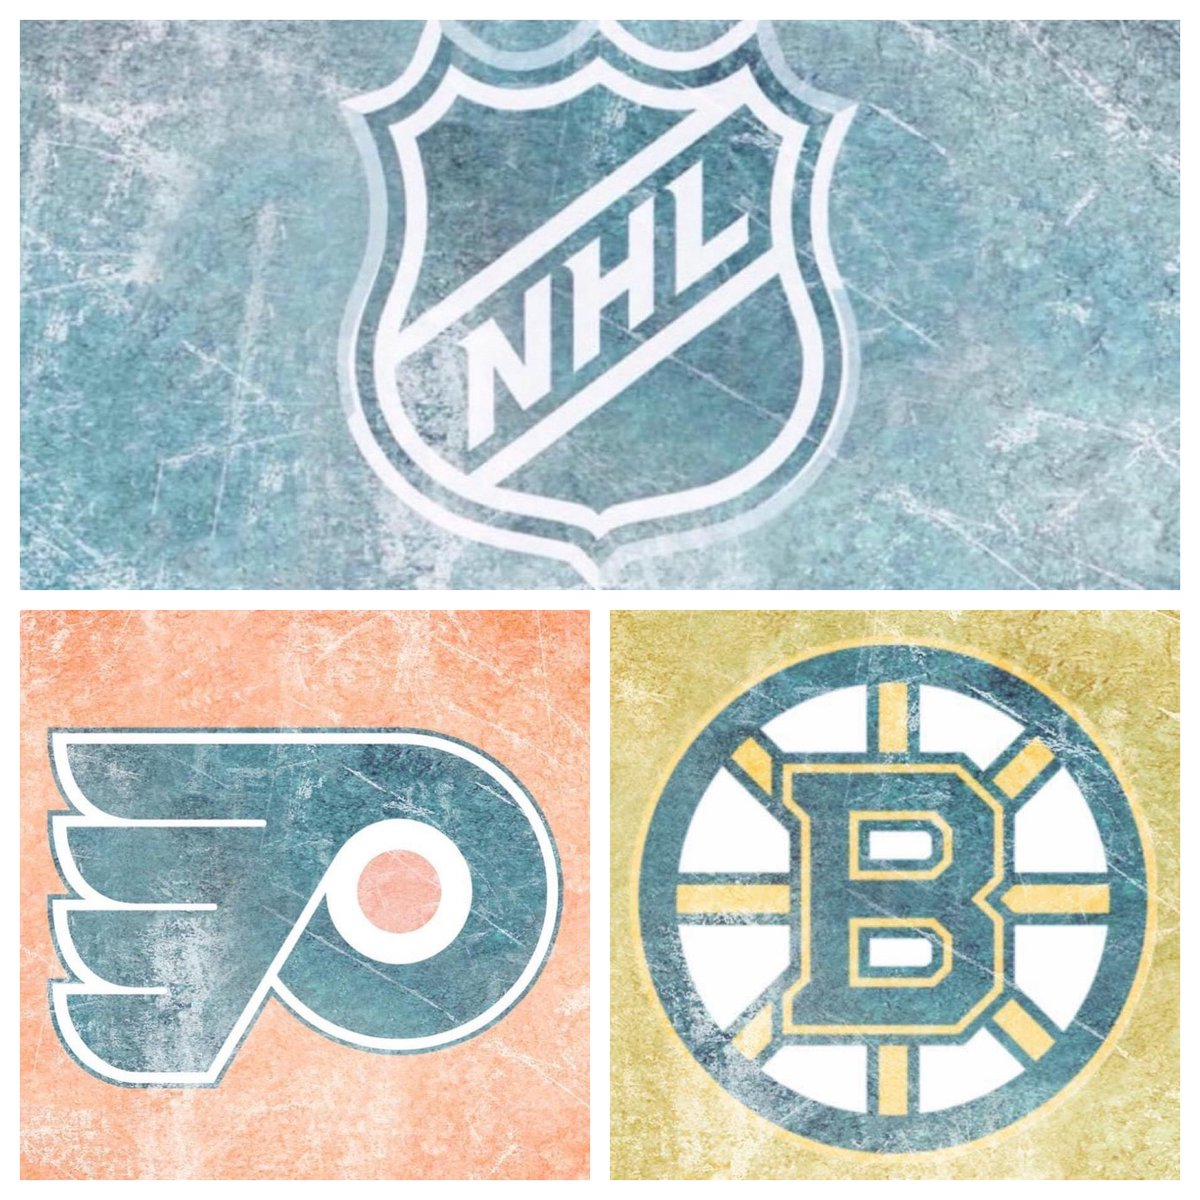 #IESRSN #Flyers @ #Bruins is underway! #NHL #PHIvsBOS #AnytimeAnywhere #NHLBruins